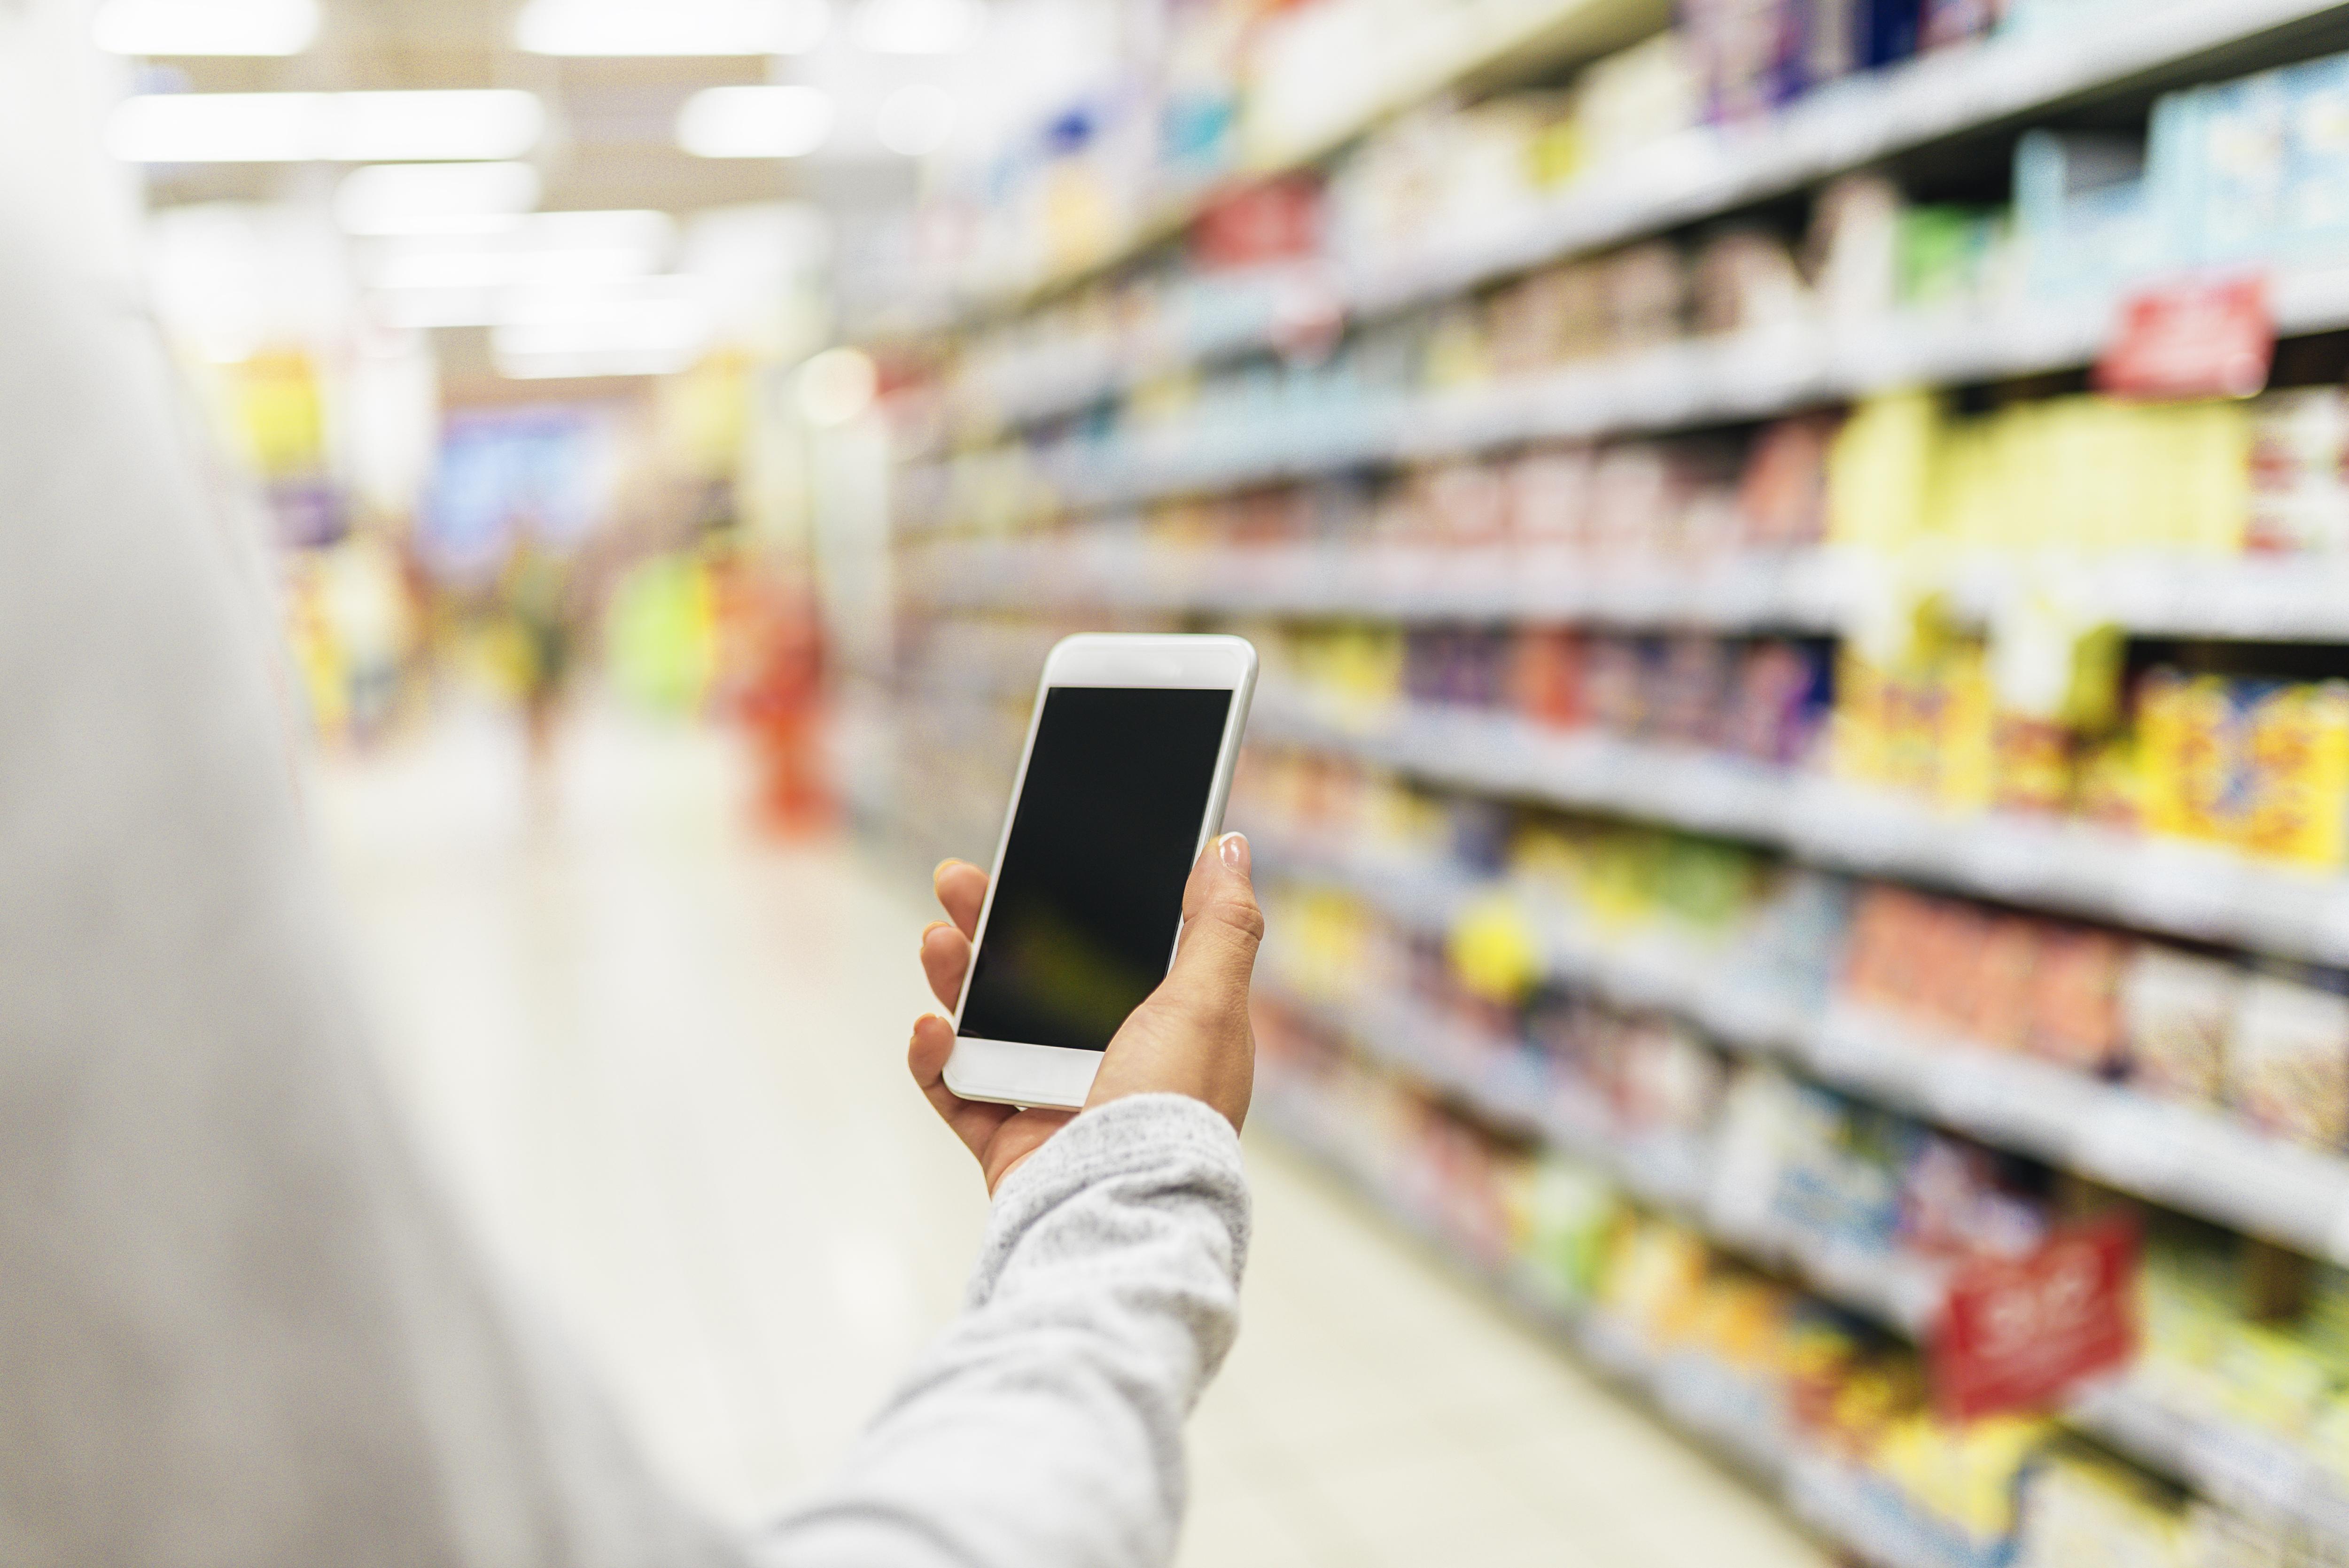 A man checks his smartphone while shopping.